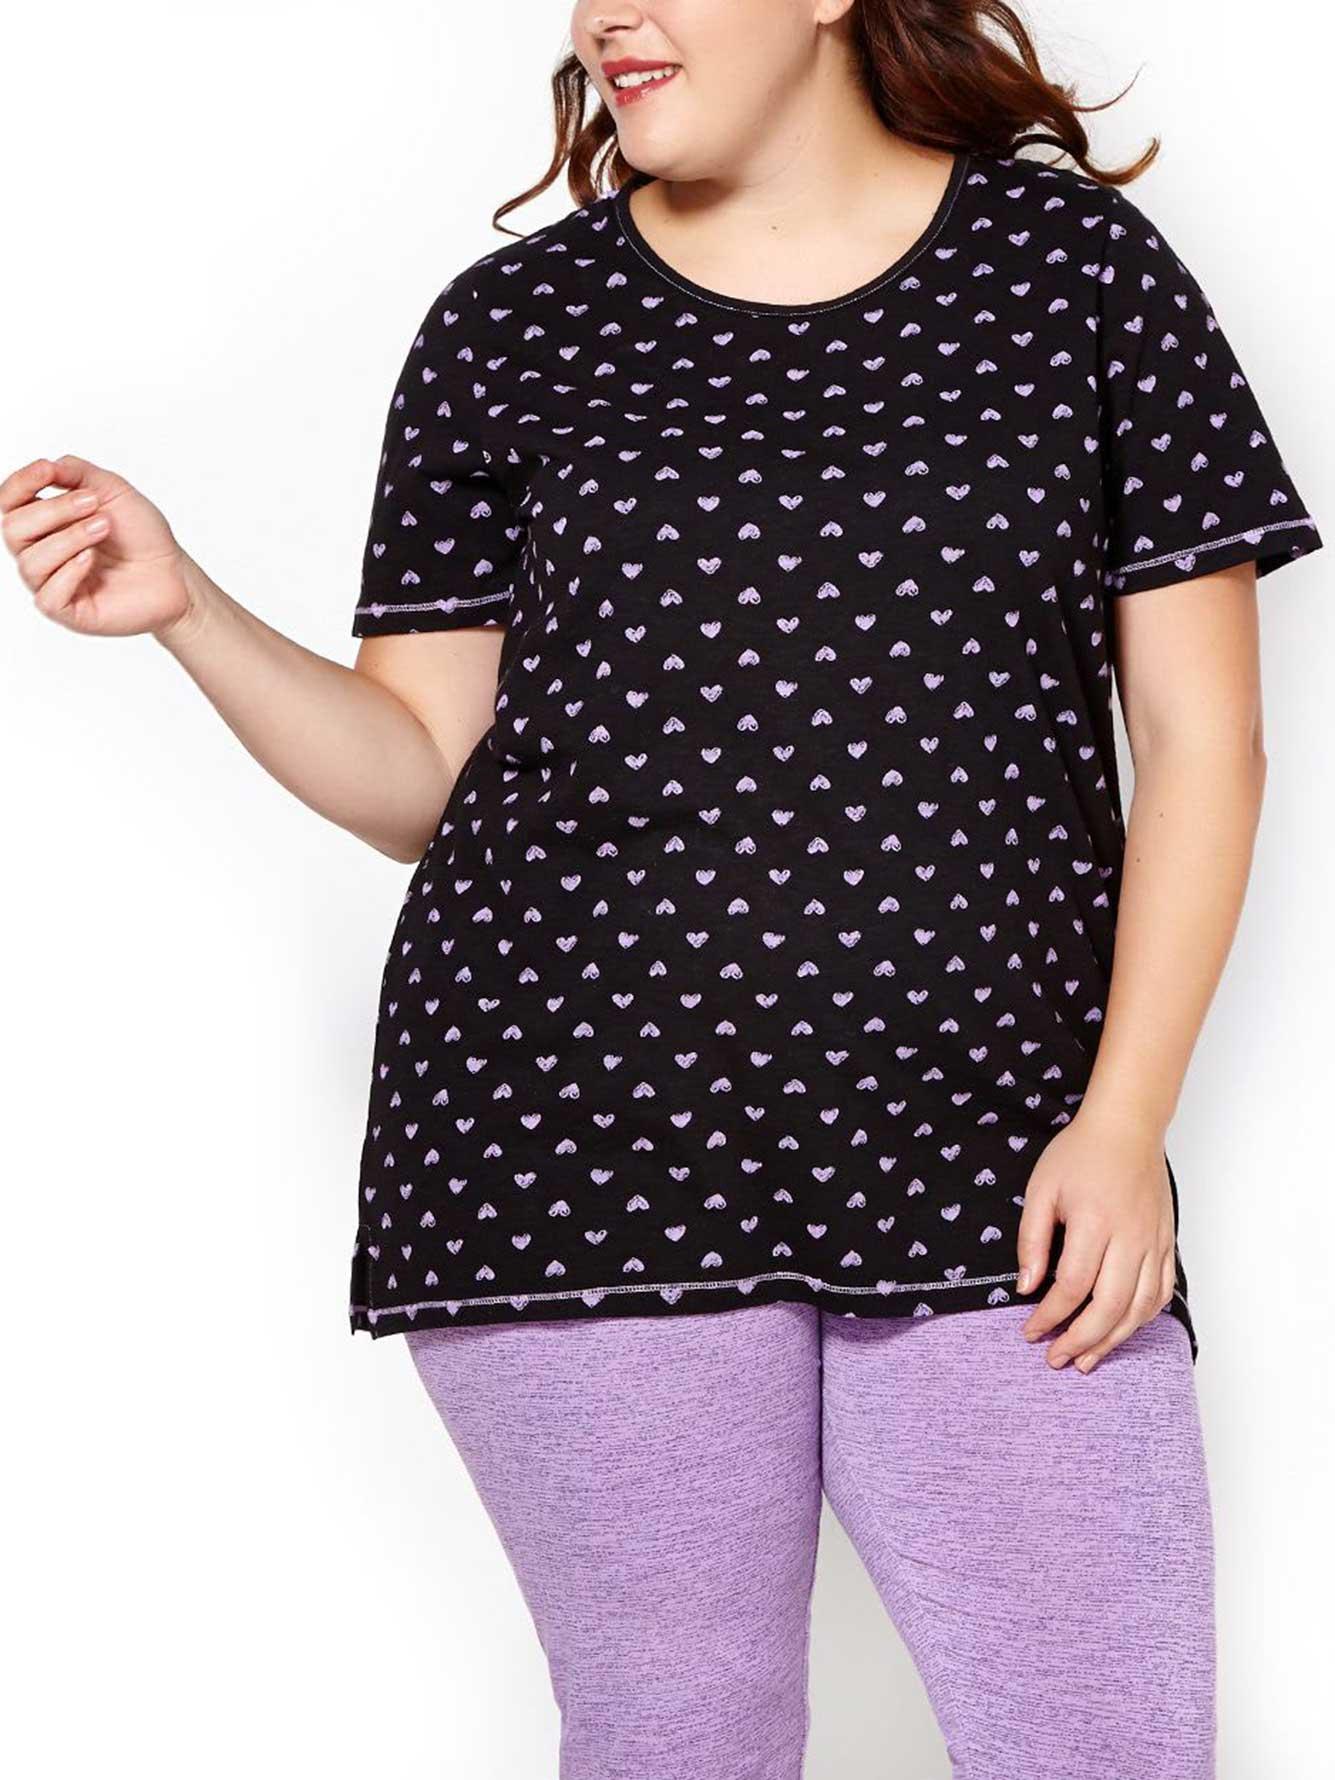 22b7002f7 Ti Voglio Printed PJ T-Shirt with Lace | Penningtons